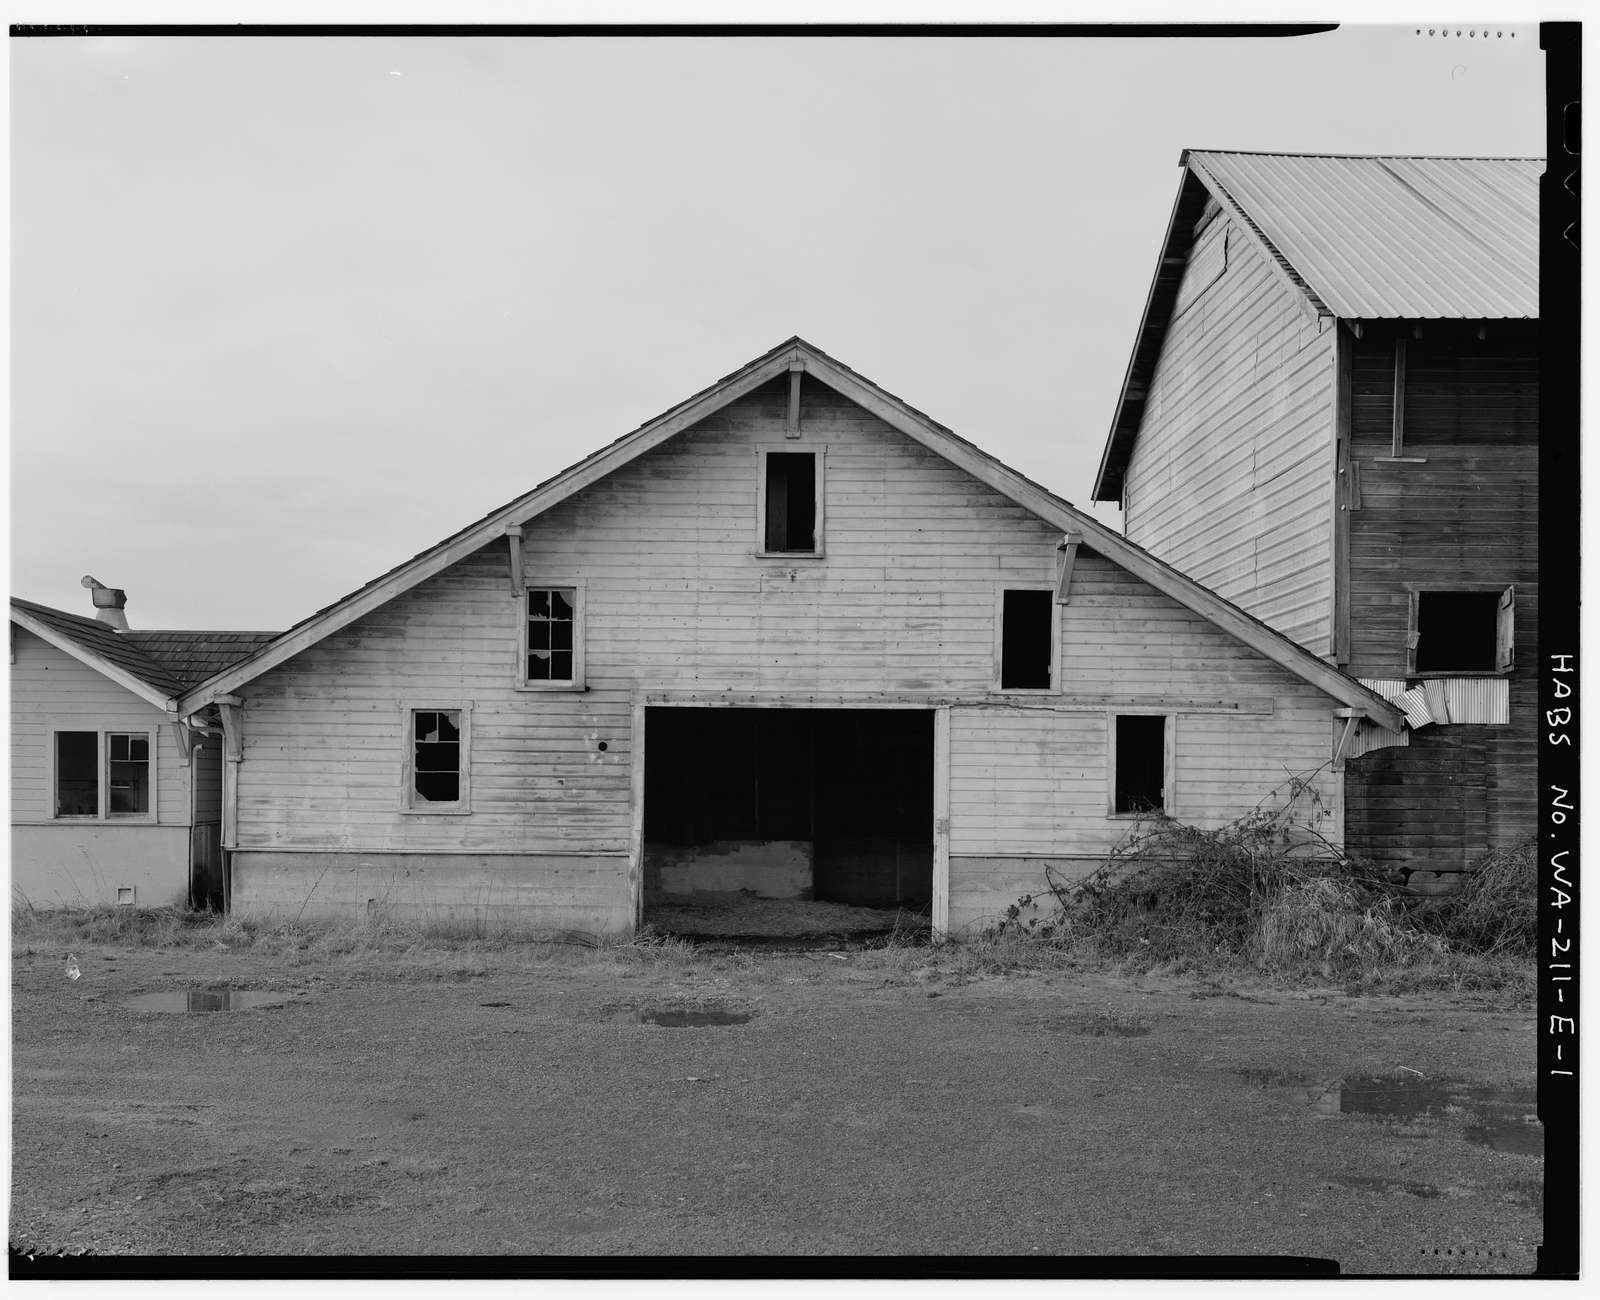 Kosai Farm, Milk Barn, B Street north of Northwest Twenty-ninth Street, Auburn, King County, WA